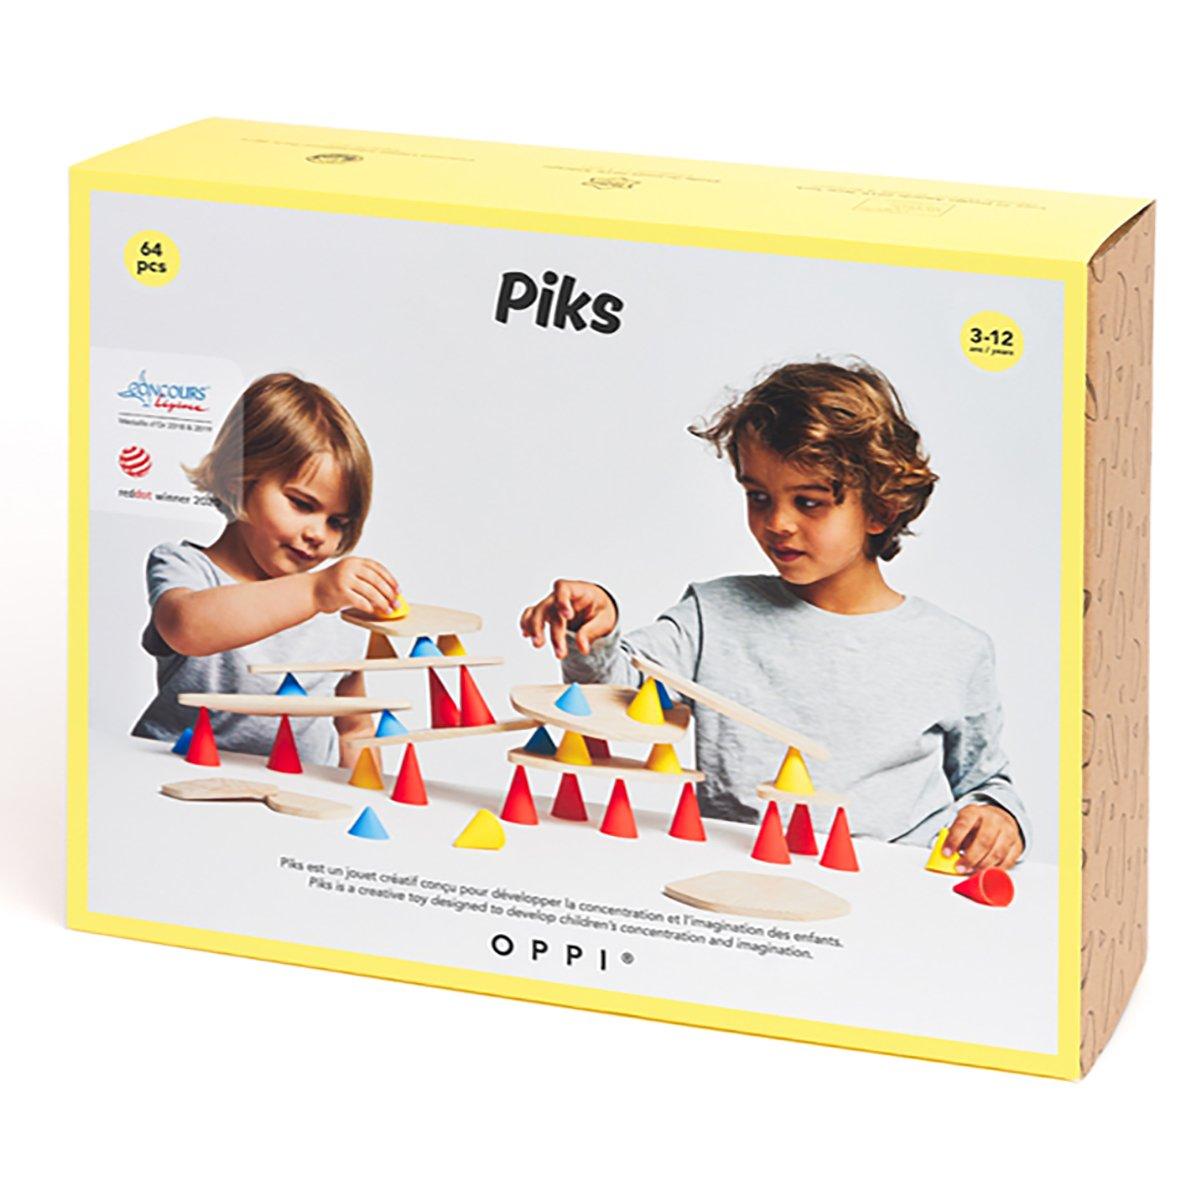 Joc educativ Piks, Kit mare, 64 piese